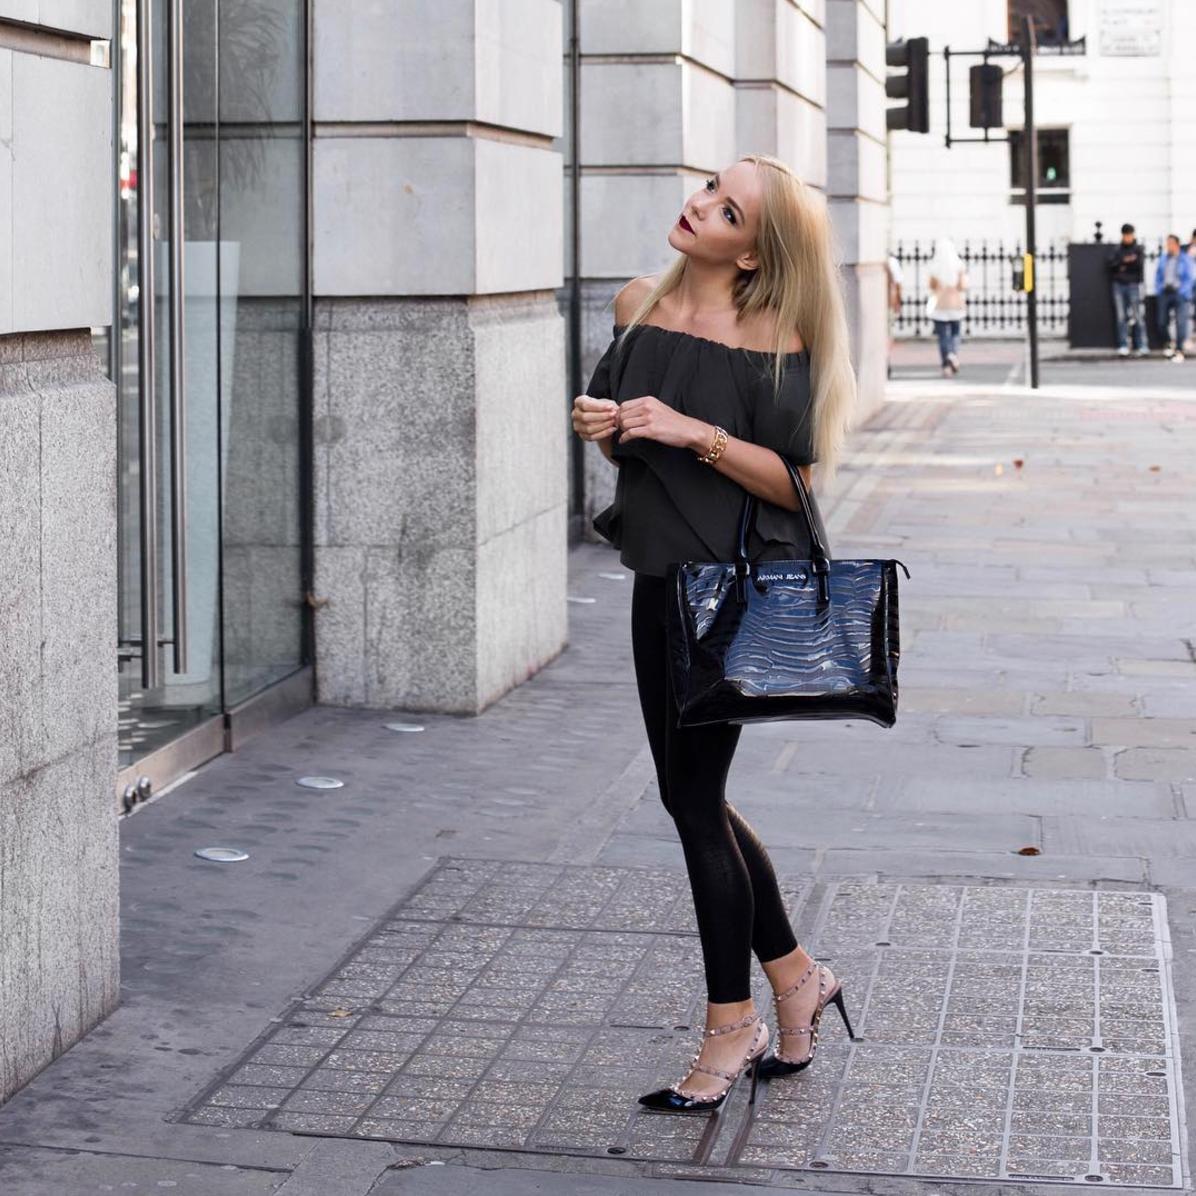 leather pants valentino rockstud high heels khaki off shoulder top